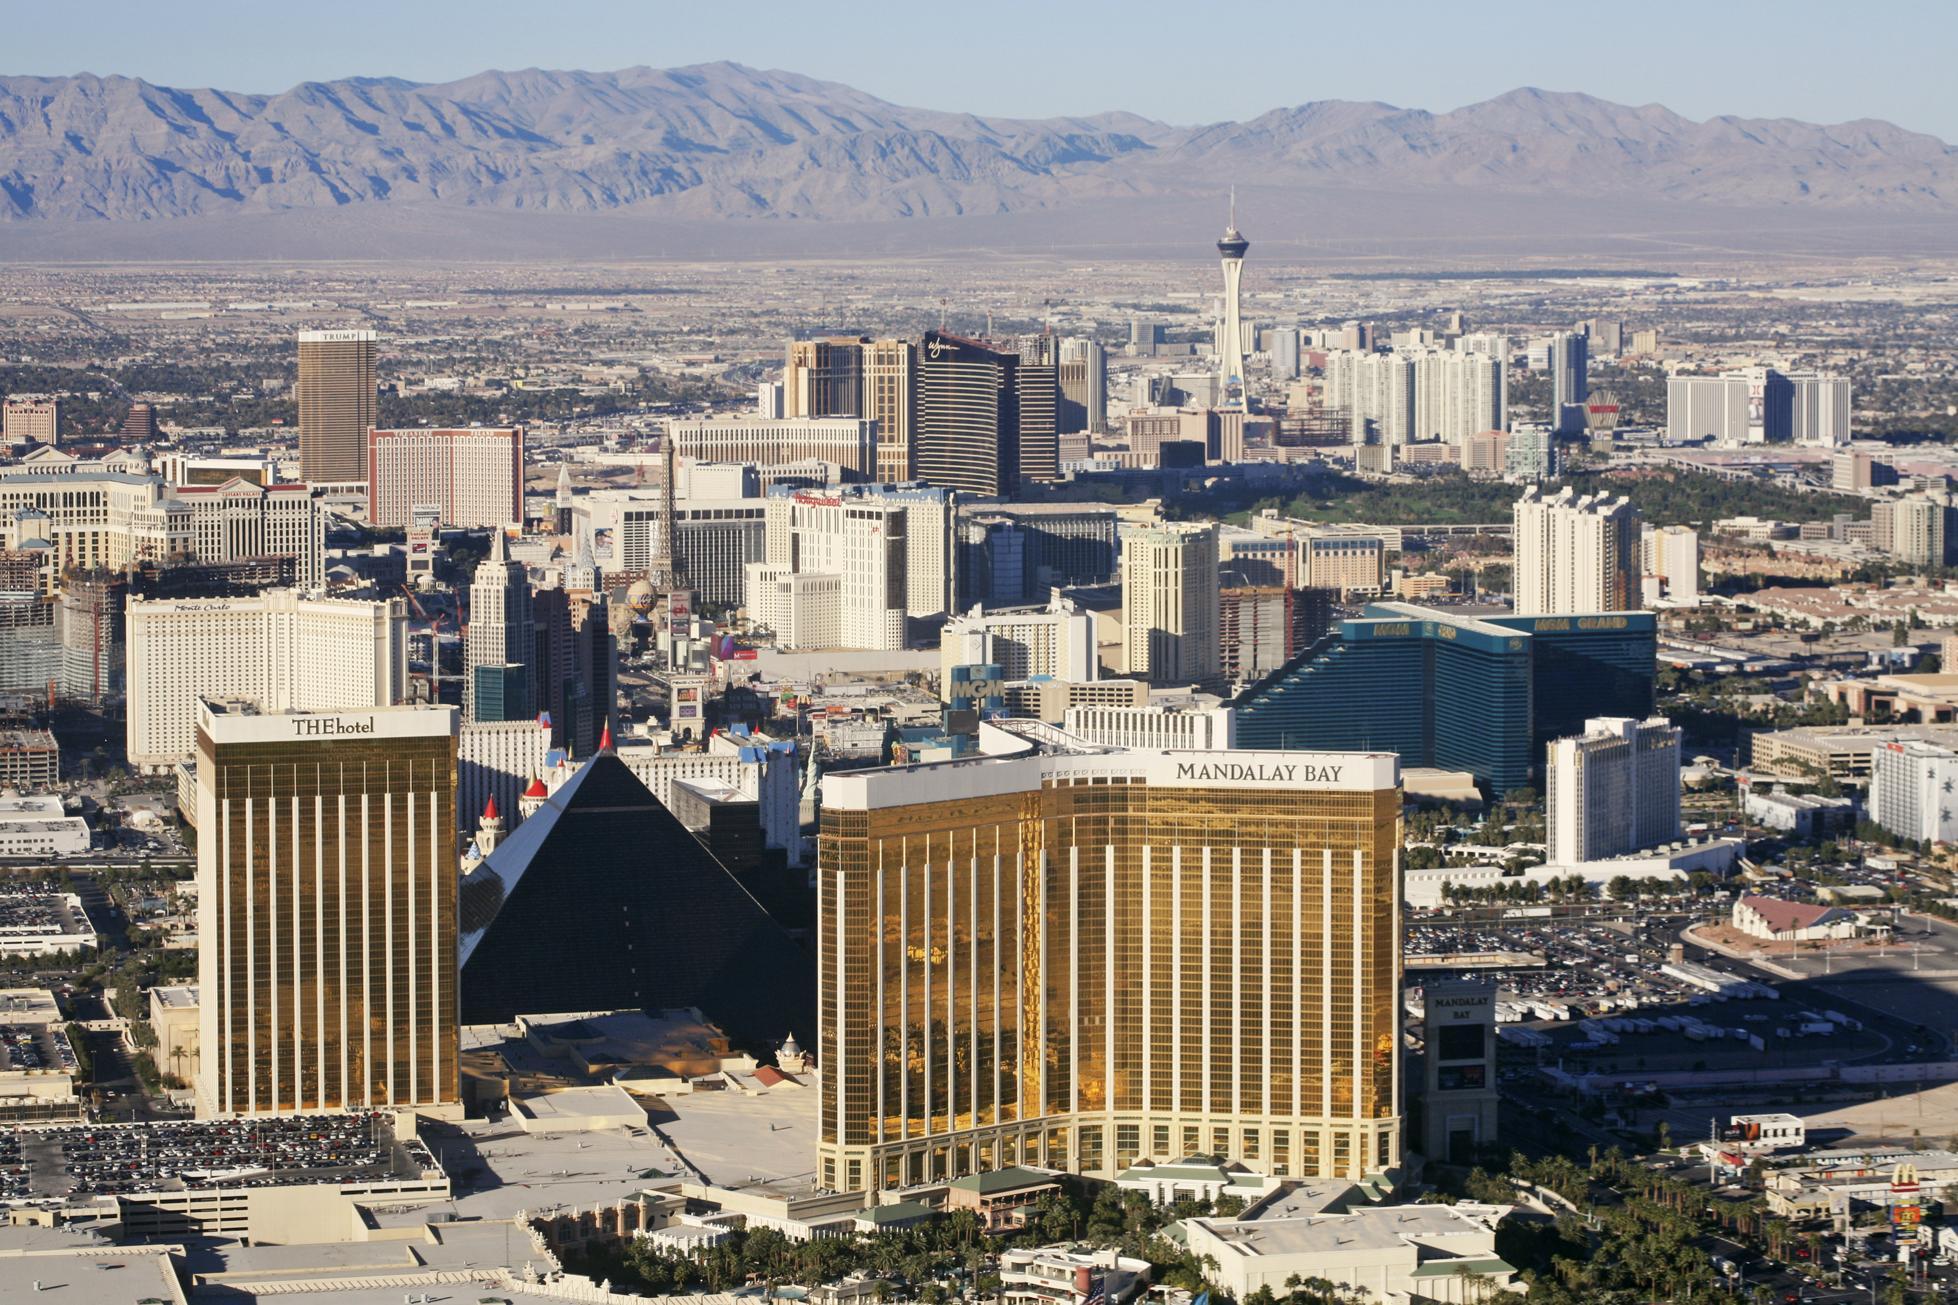 Aerial View of Las Vegas, Nevada